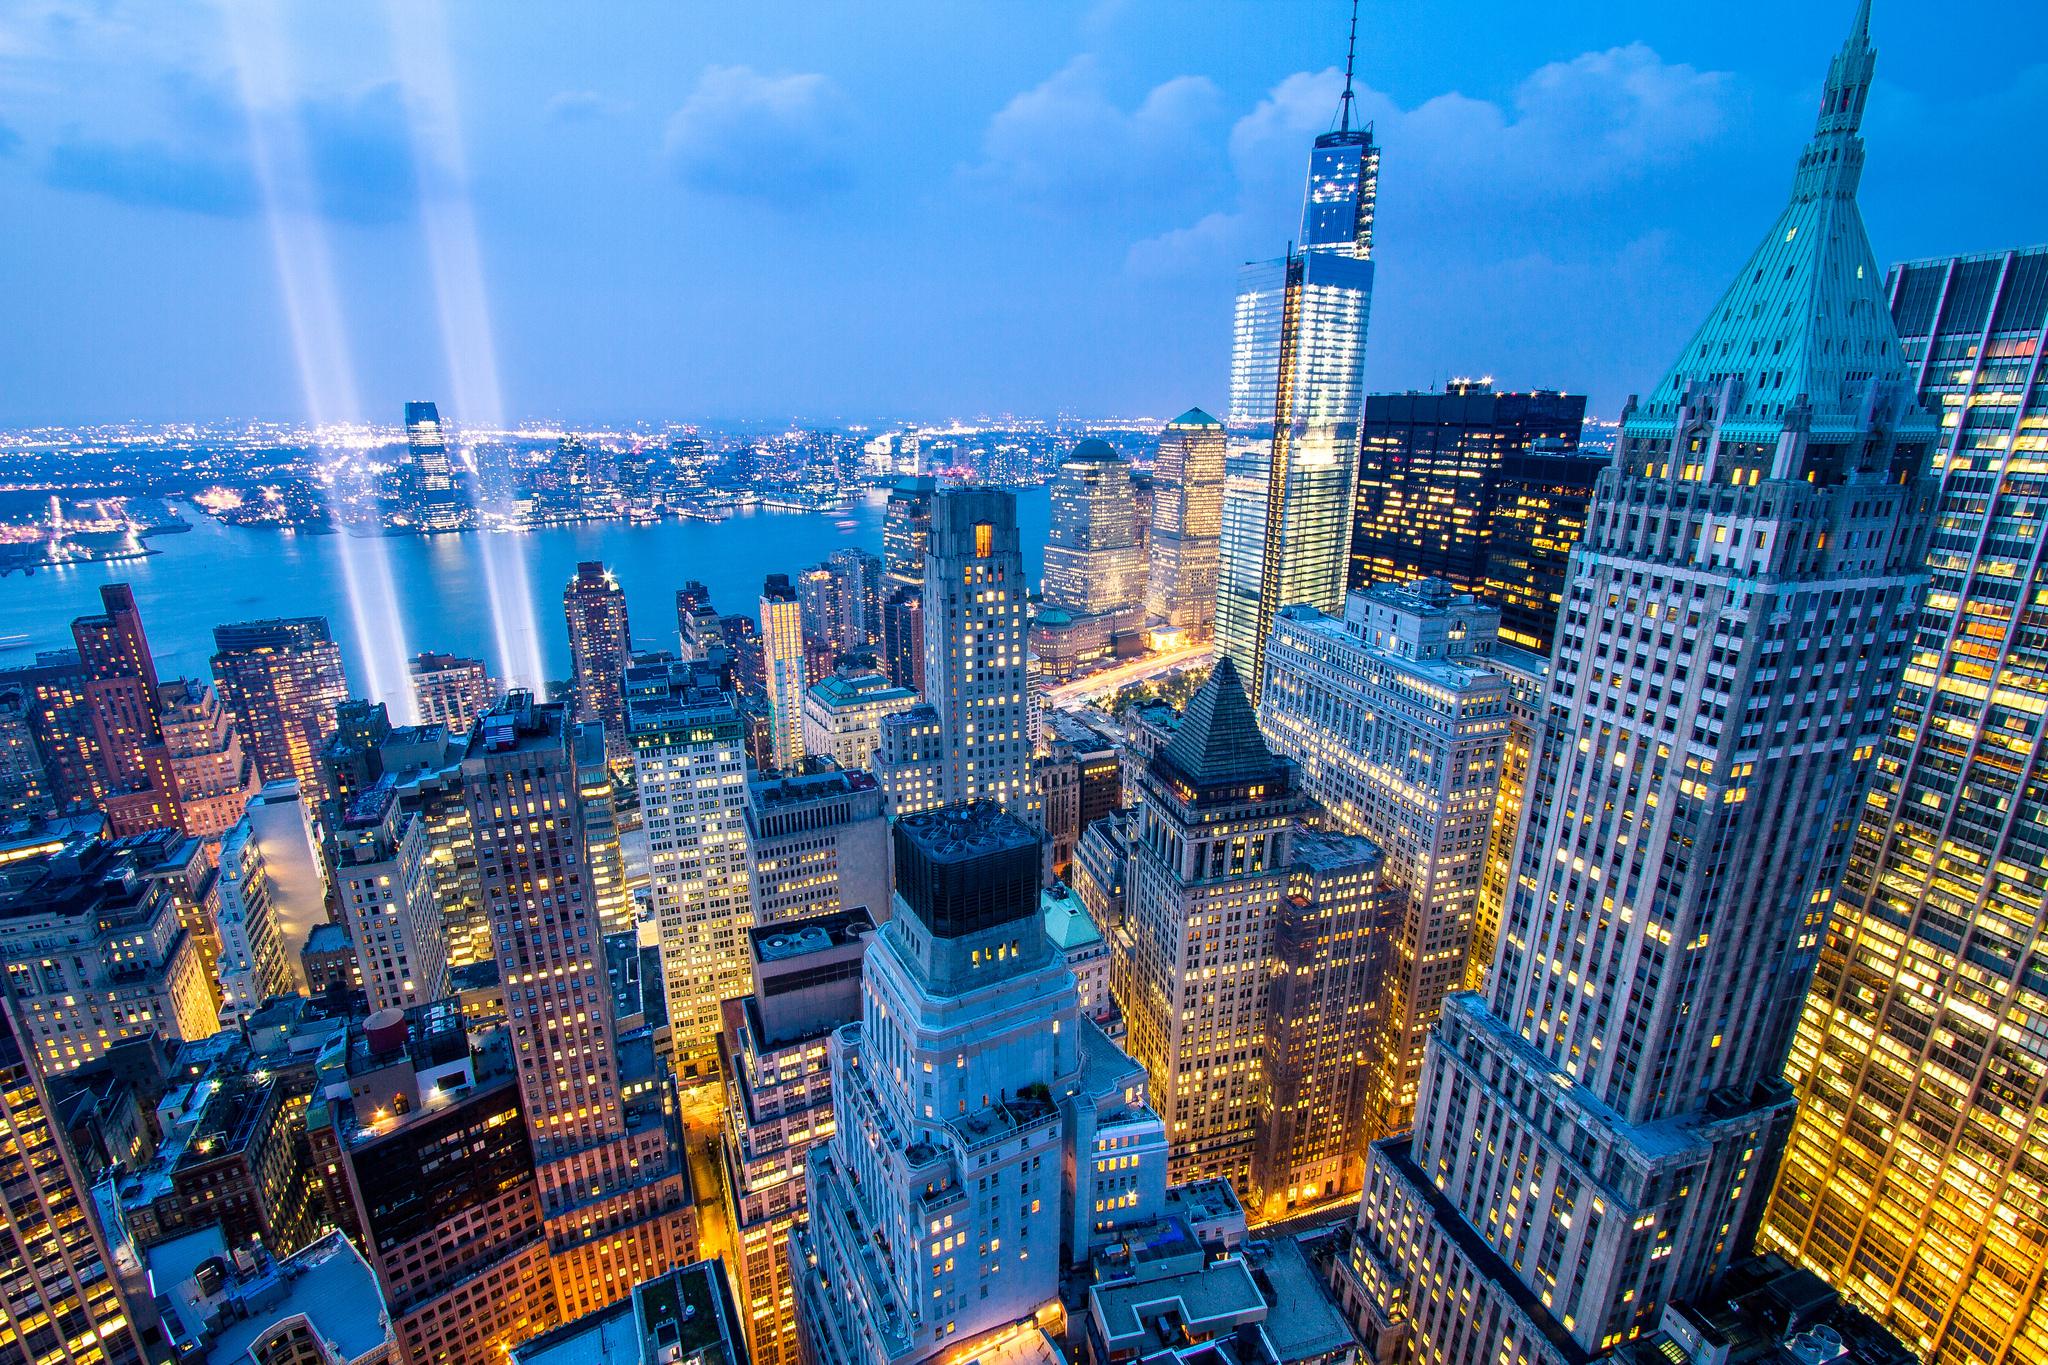 New York Skyline Wallpaper Creative New York Skyline 2048x1365